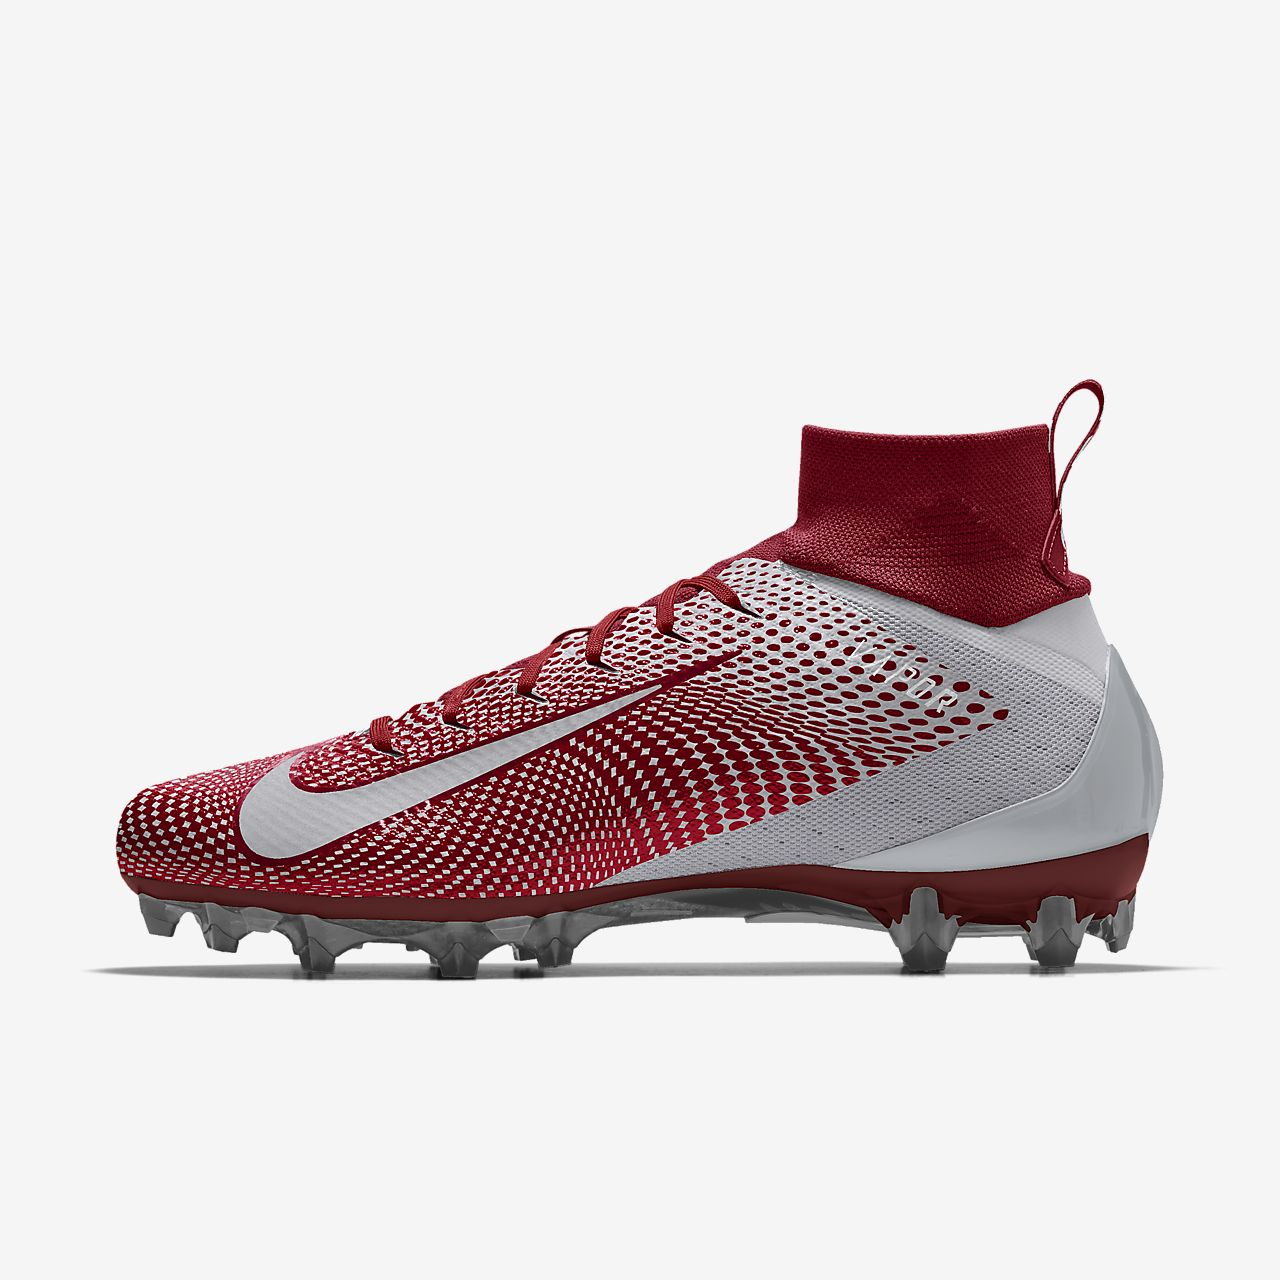 Nike Vapor Untouchable Pro 3 By You personalisierbarer Herren-Fußballschuh